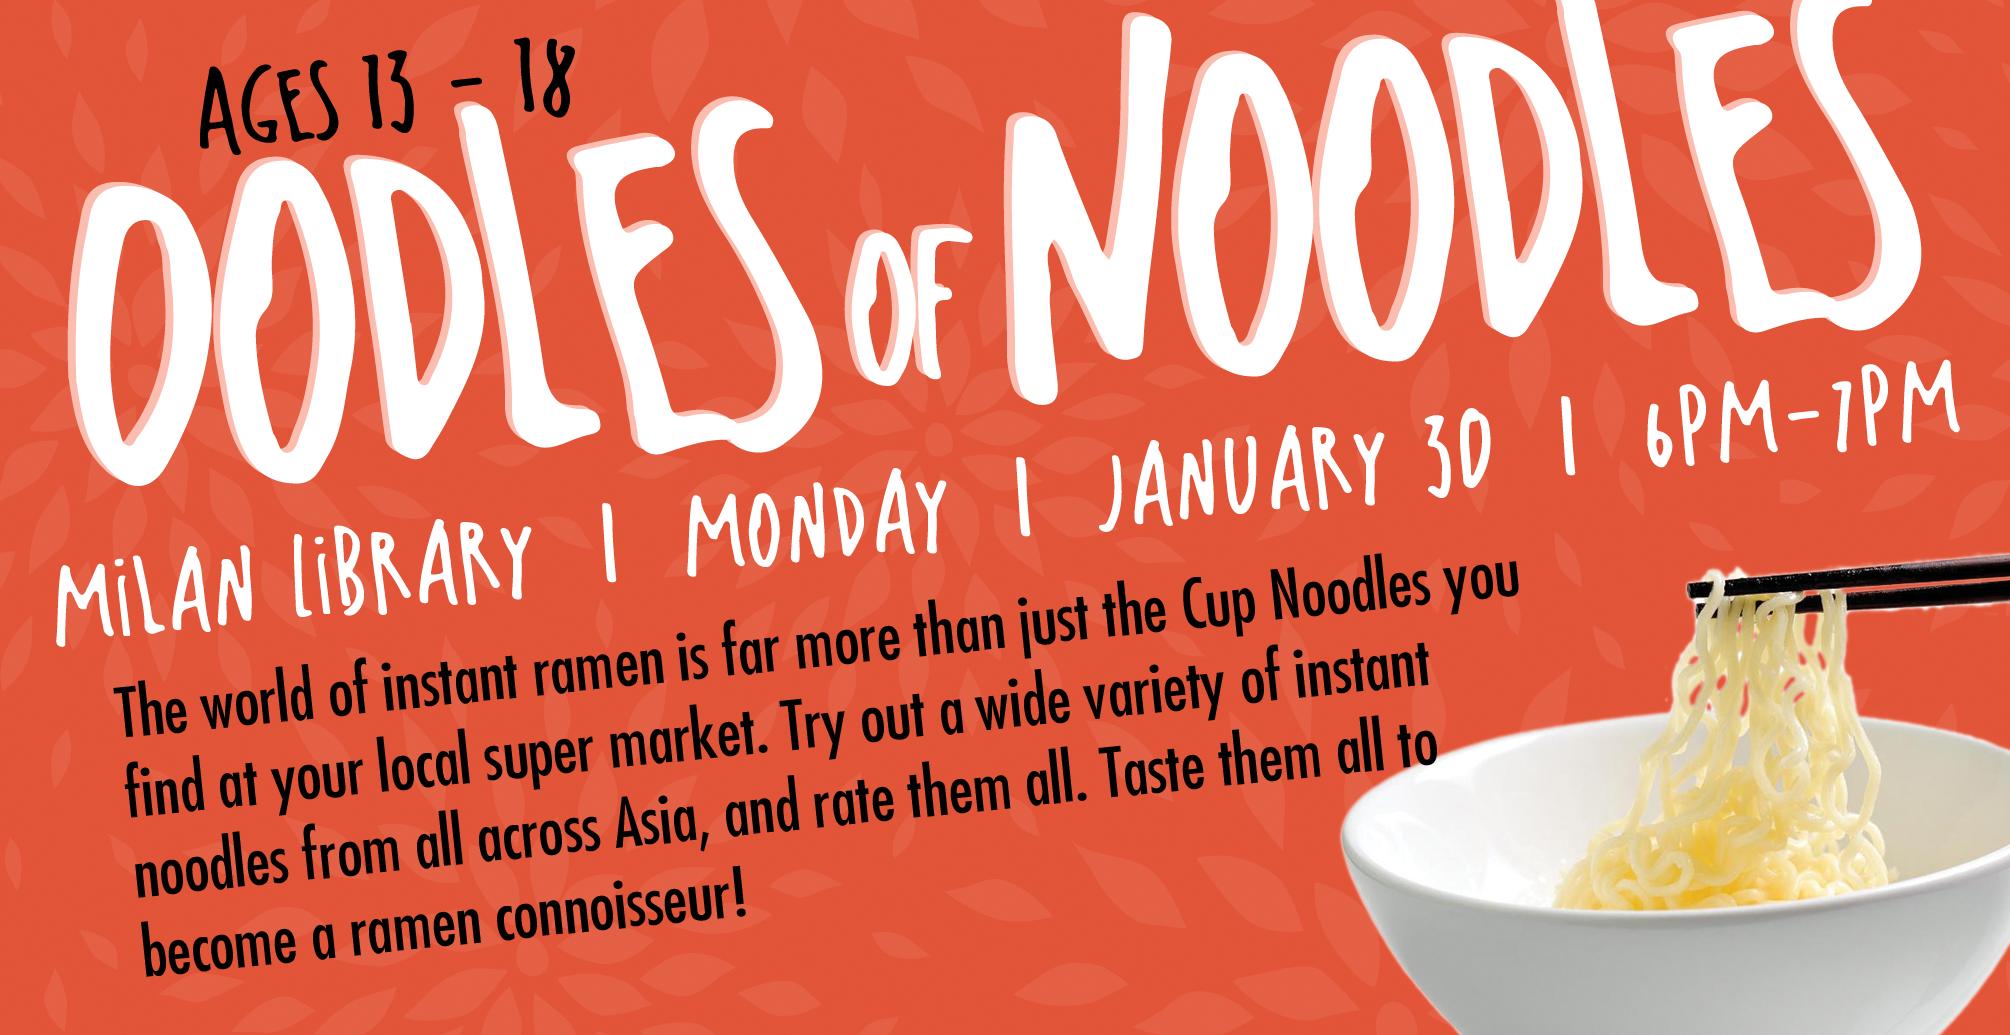 2017-01-TEEN-Milan-Oodles-of-Noodles-Slide